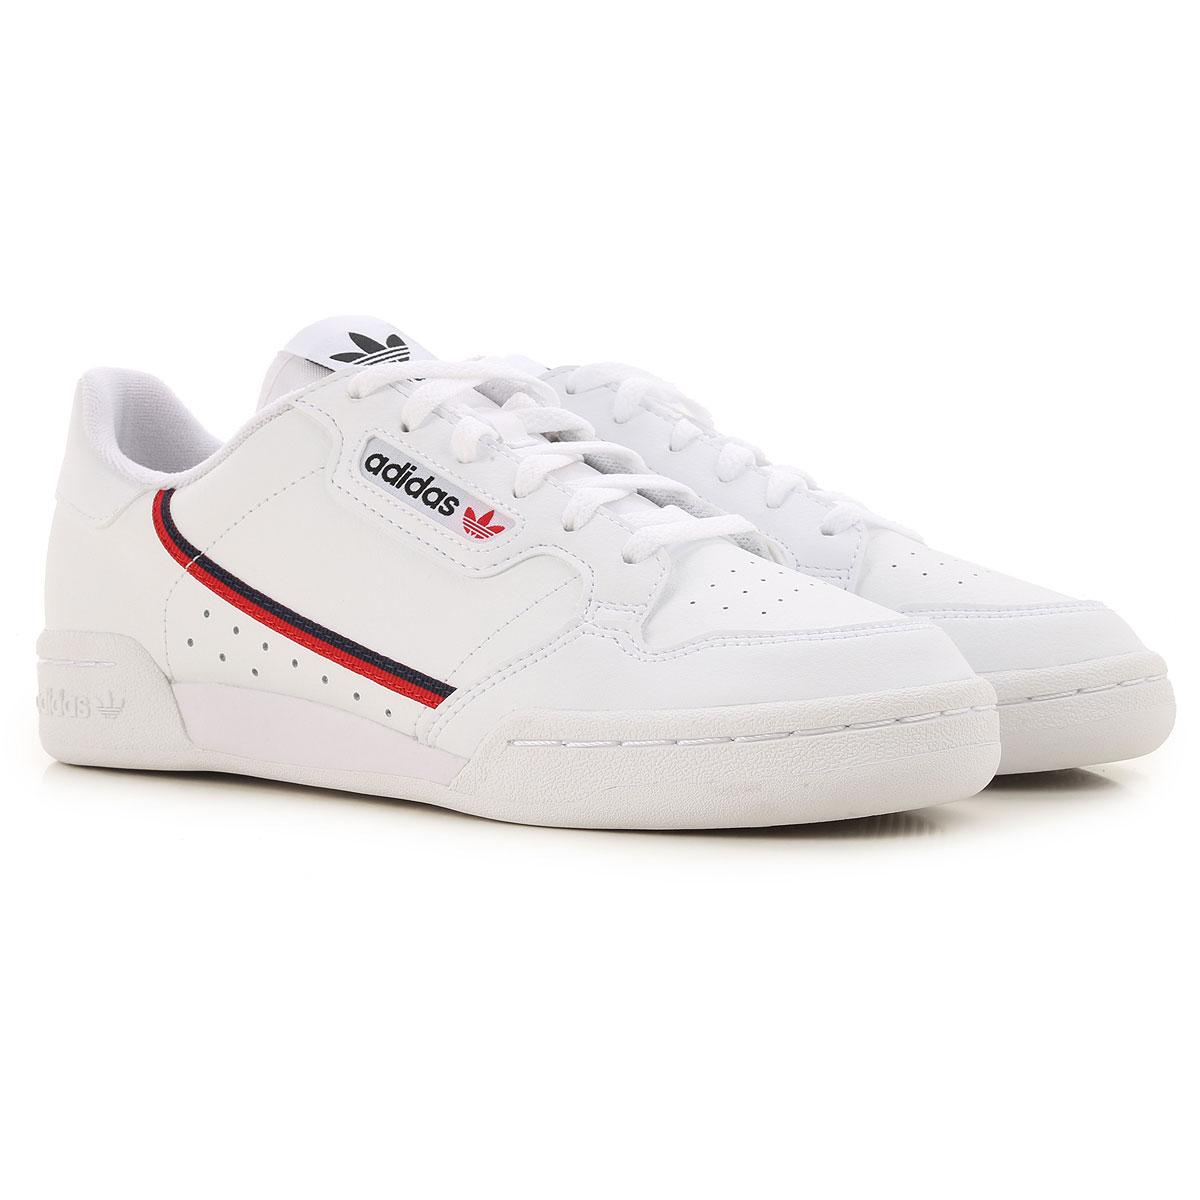 Adidas Kids Shoes for Boys On Sale, White, Leather, 2019, UK 4.5 - EUR 37.5 UK 5 - EUR 38 UK 5.5 - EUR 38.5